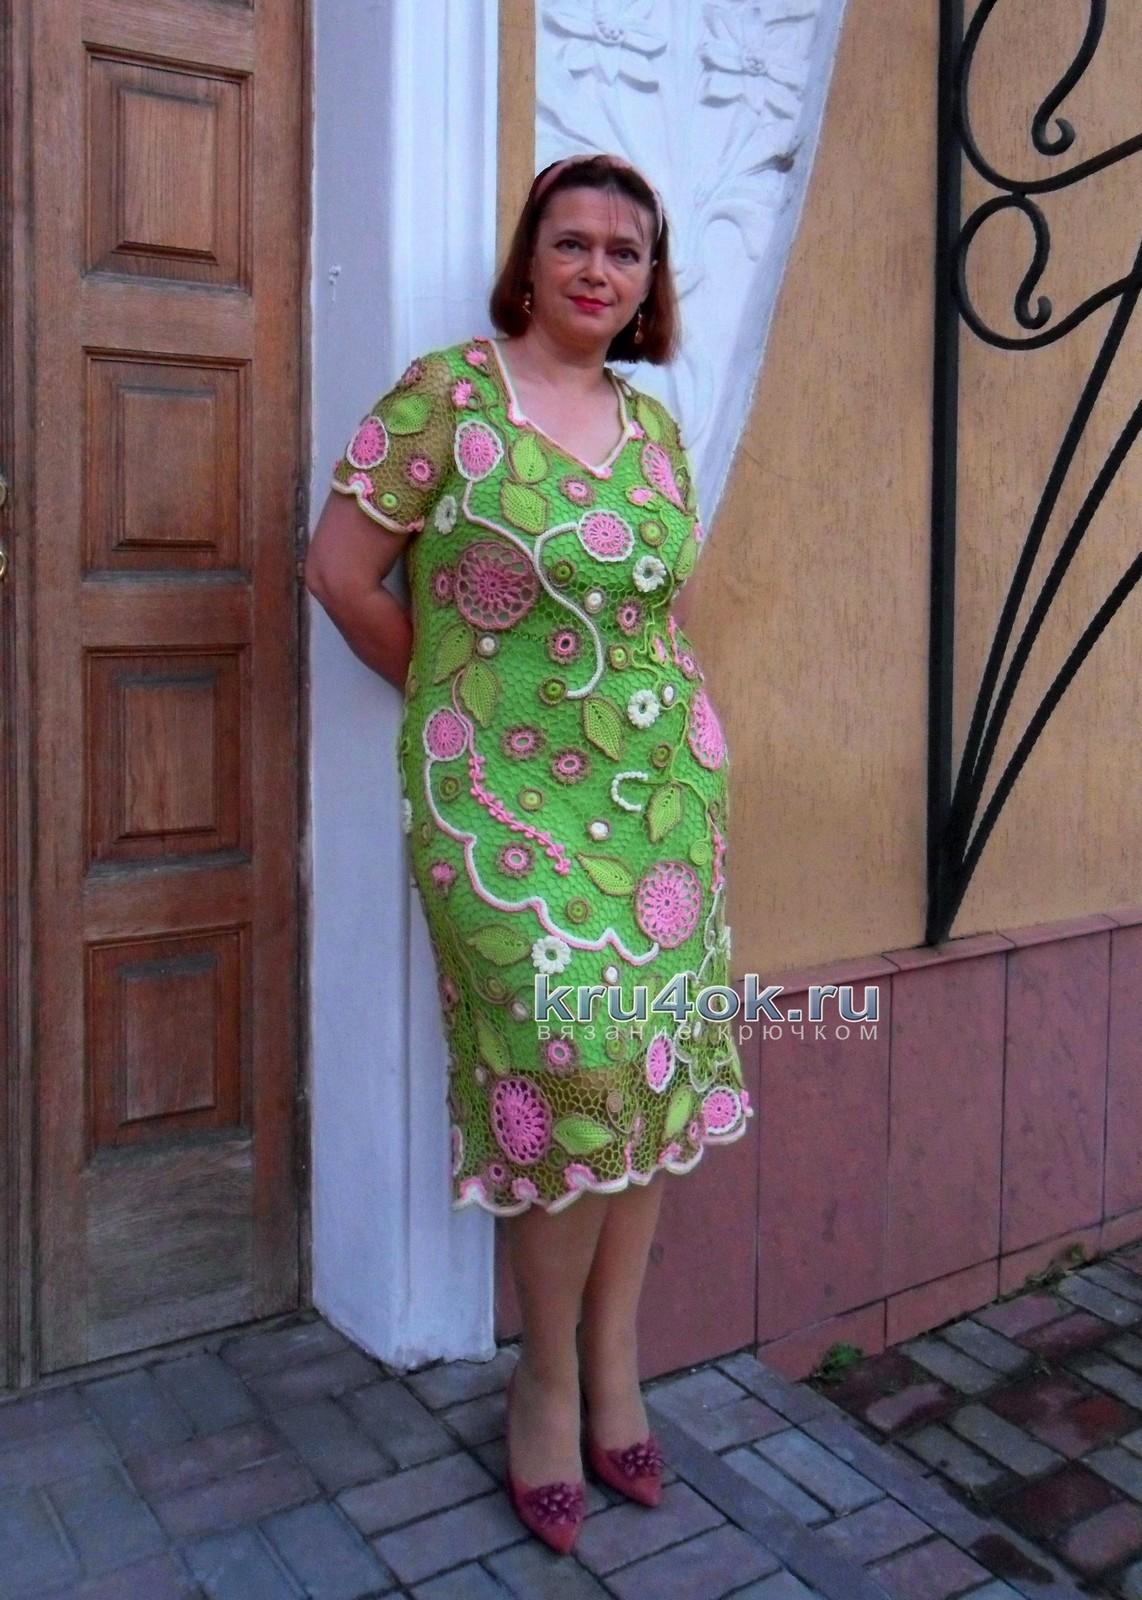 Мармелад платье фото